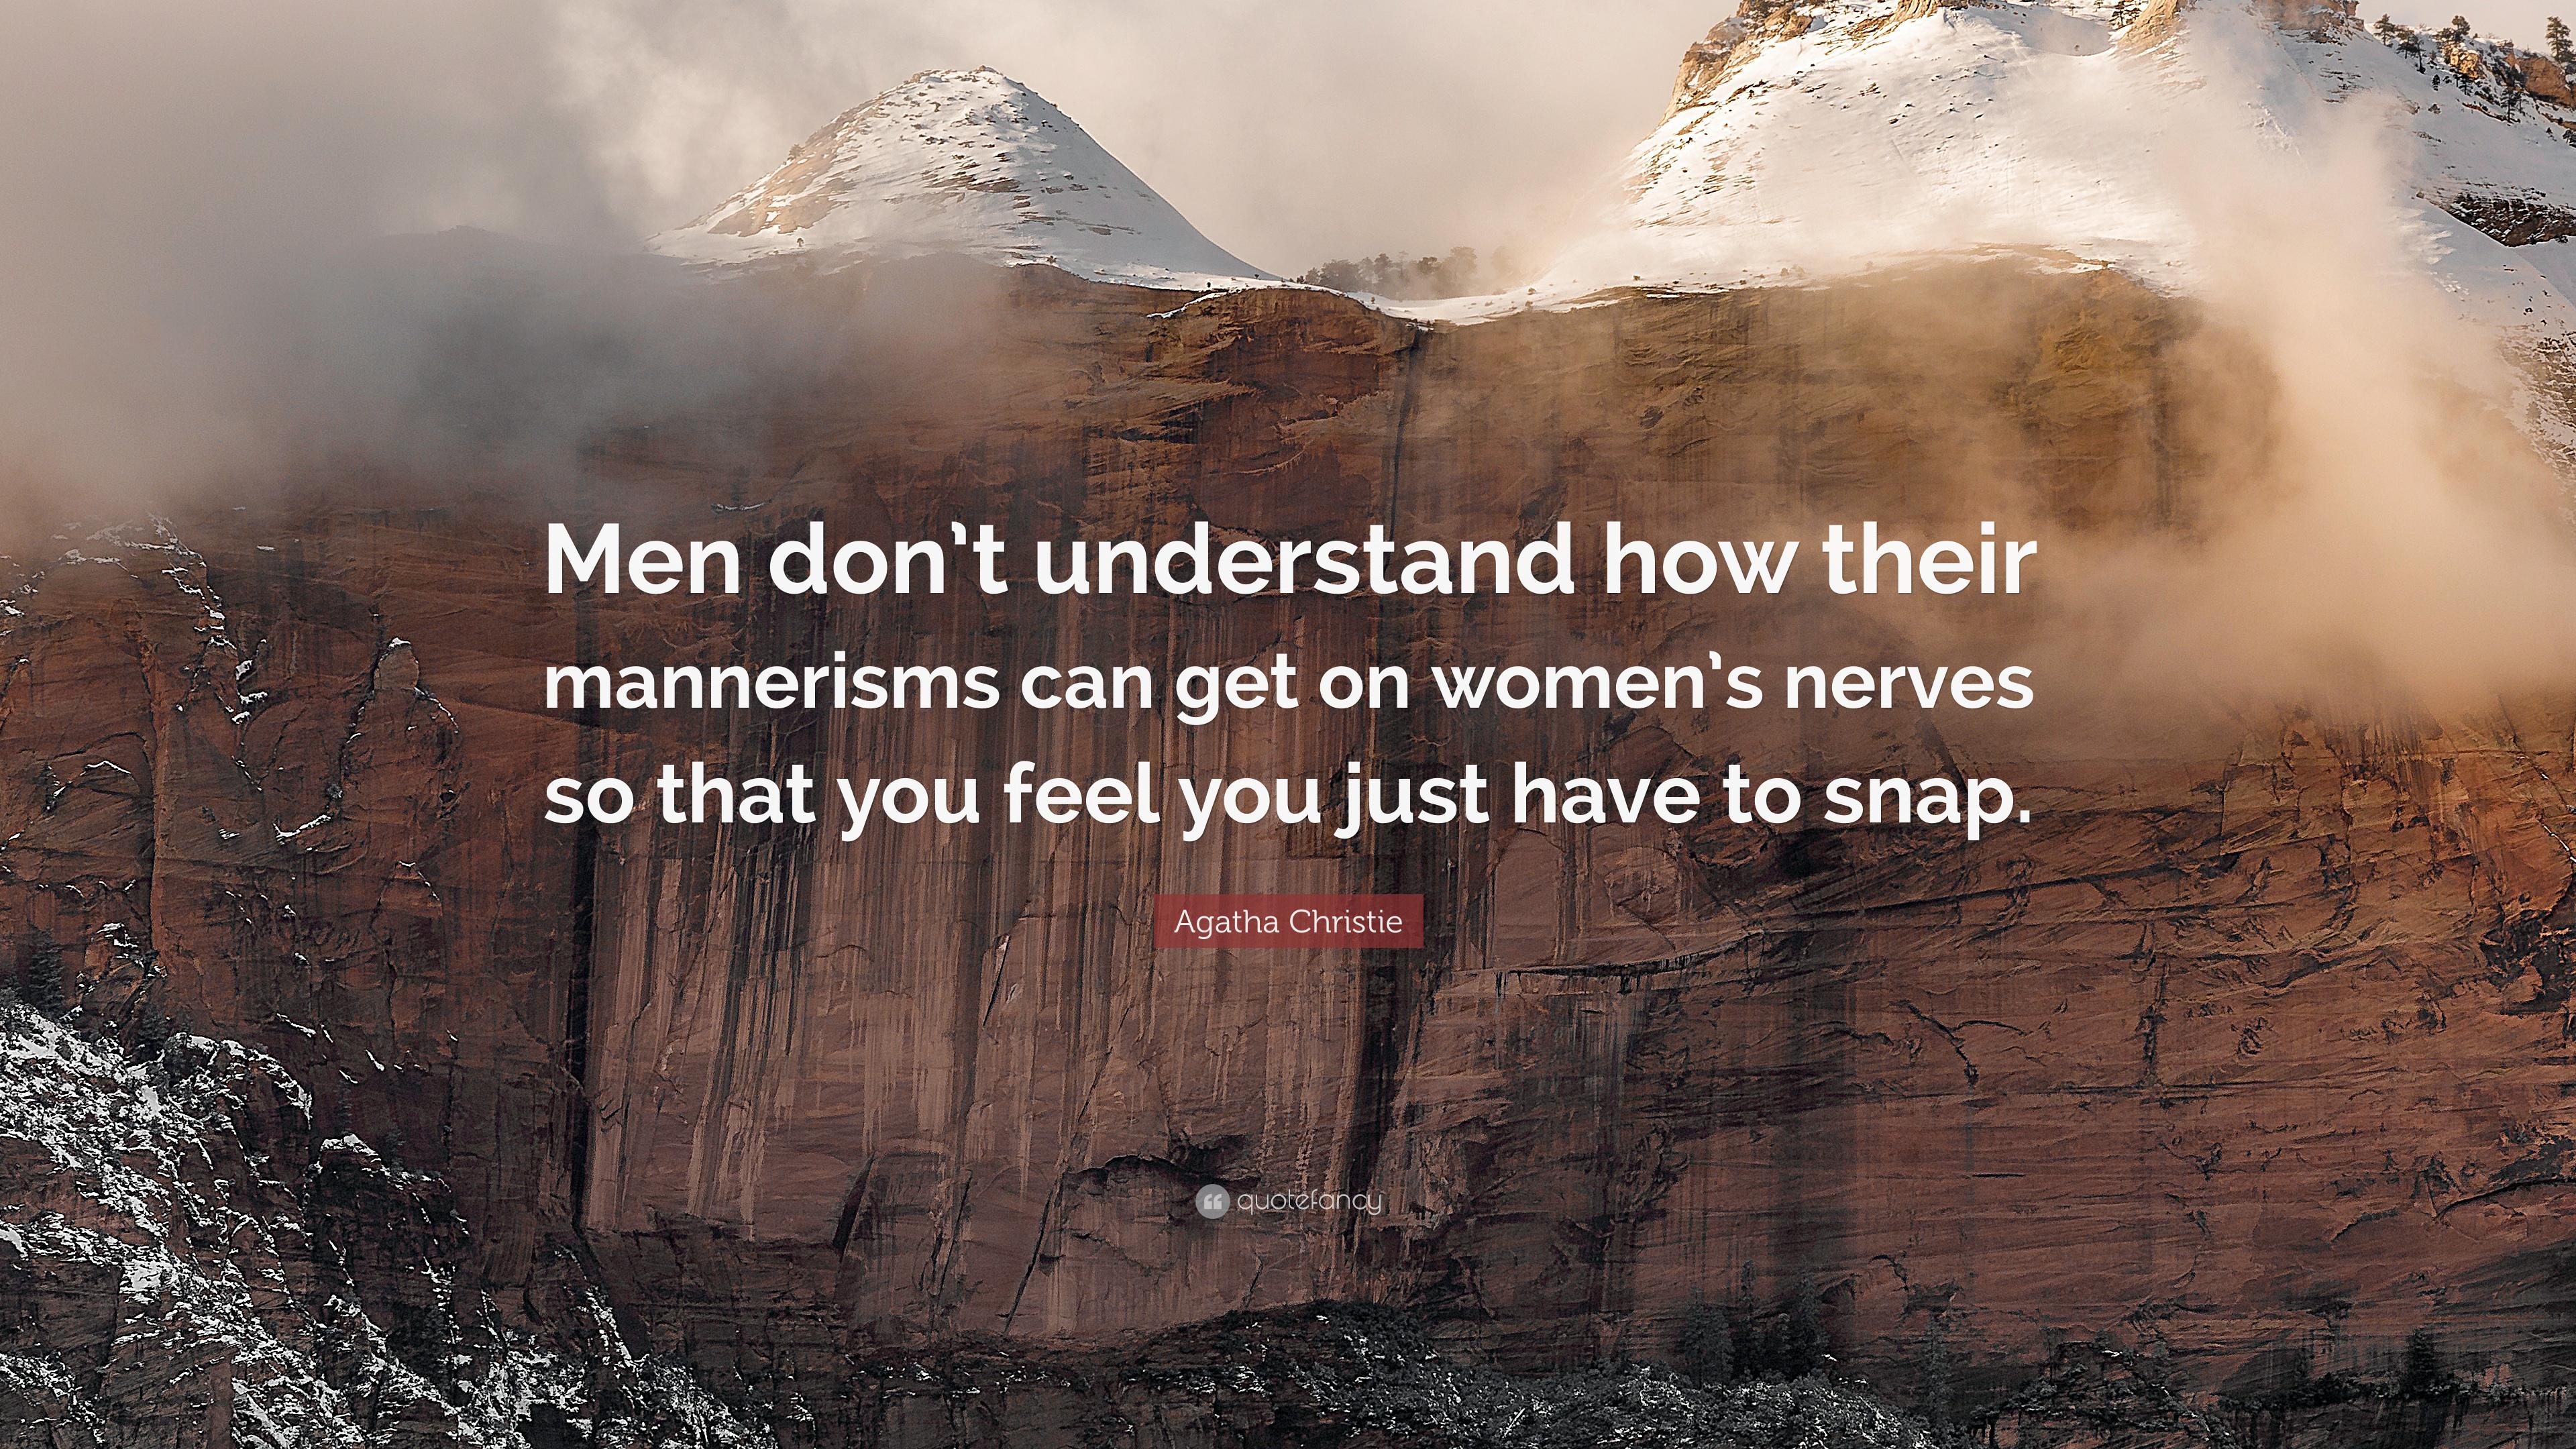 3617247-Agatha-Christie-Quote-Men-don-t-understand-how-their-mannerisms